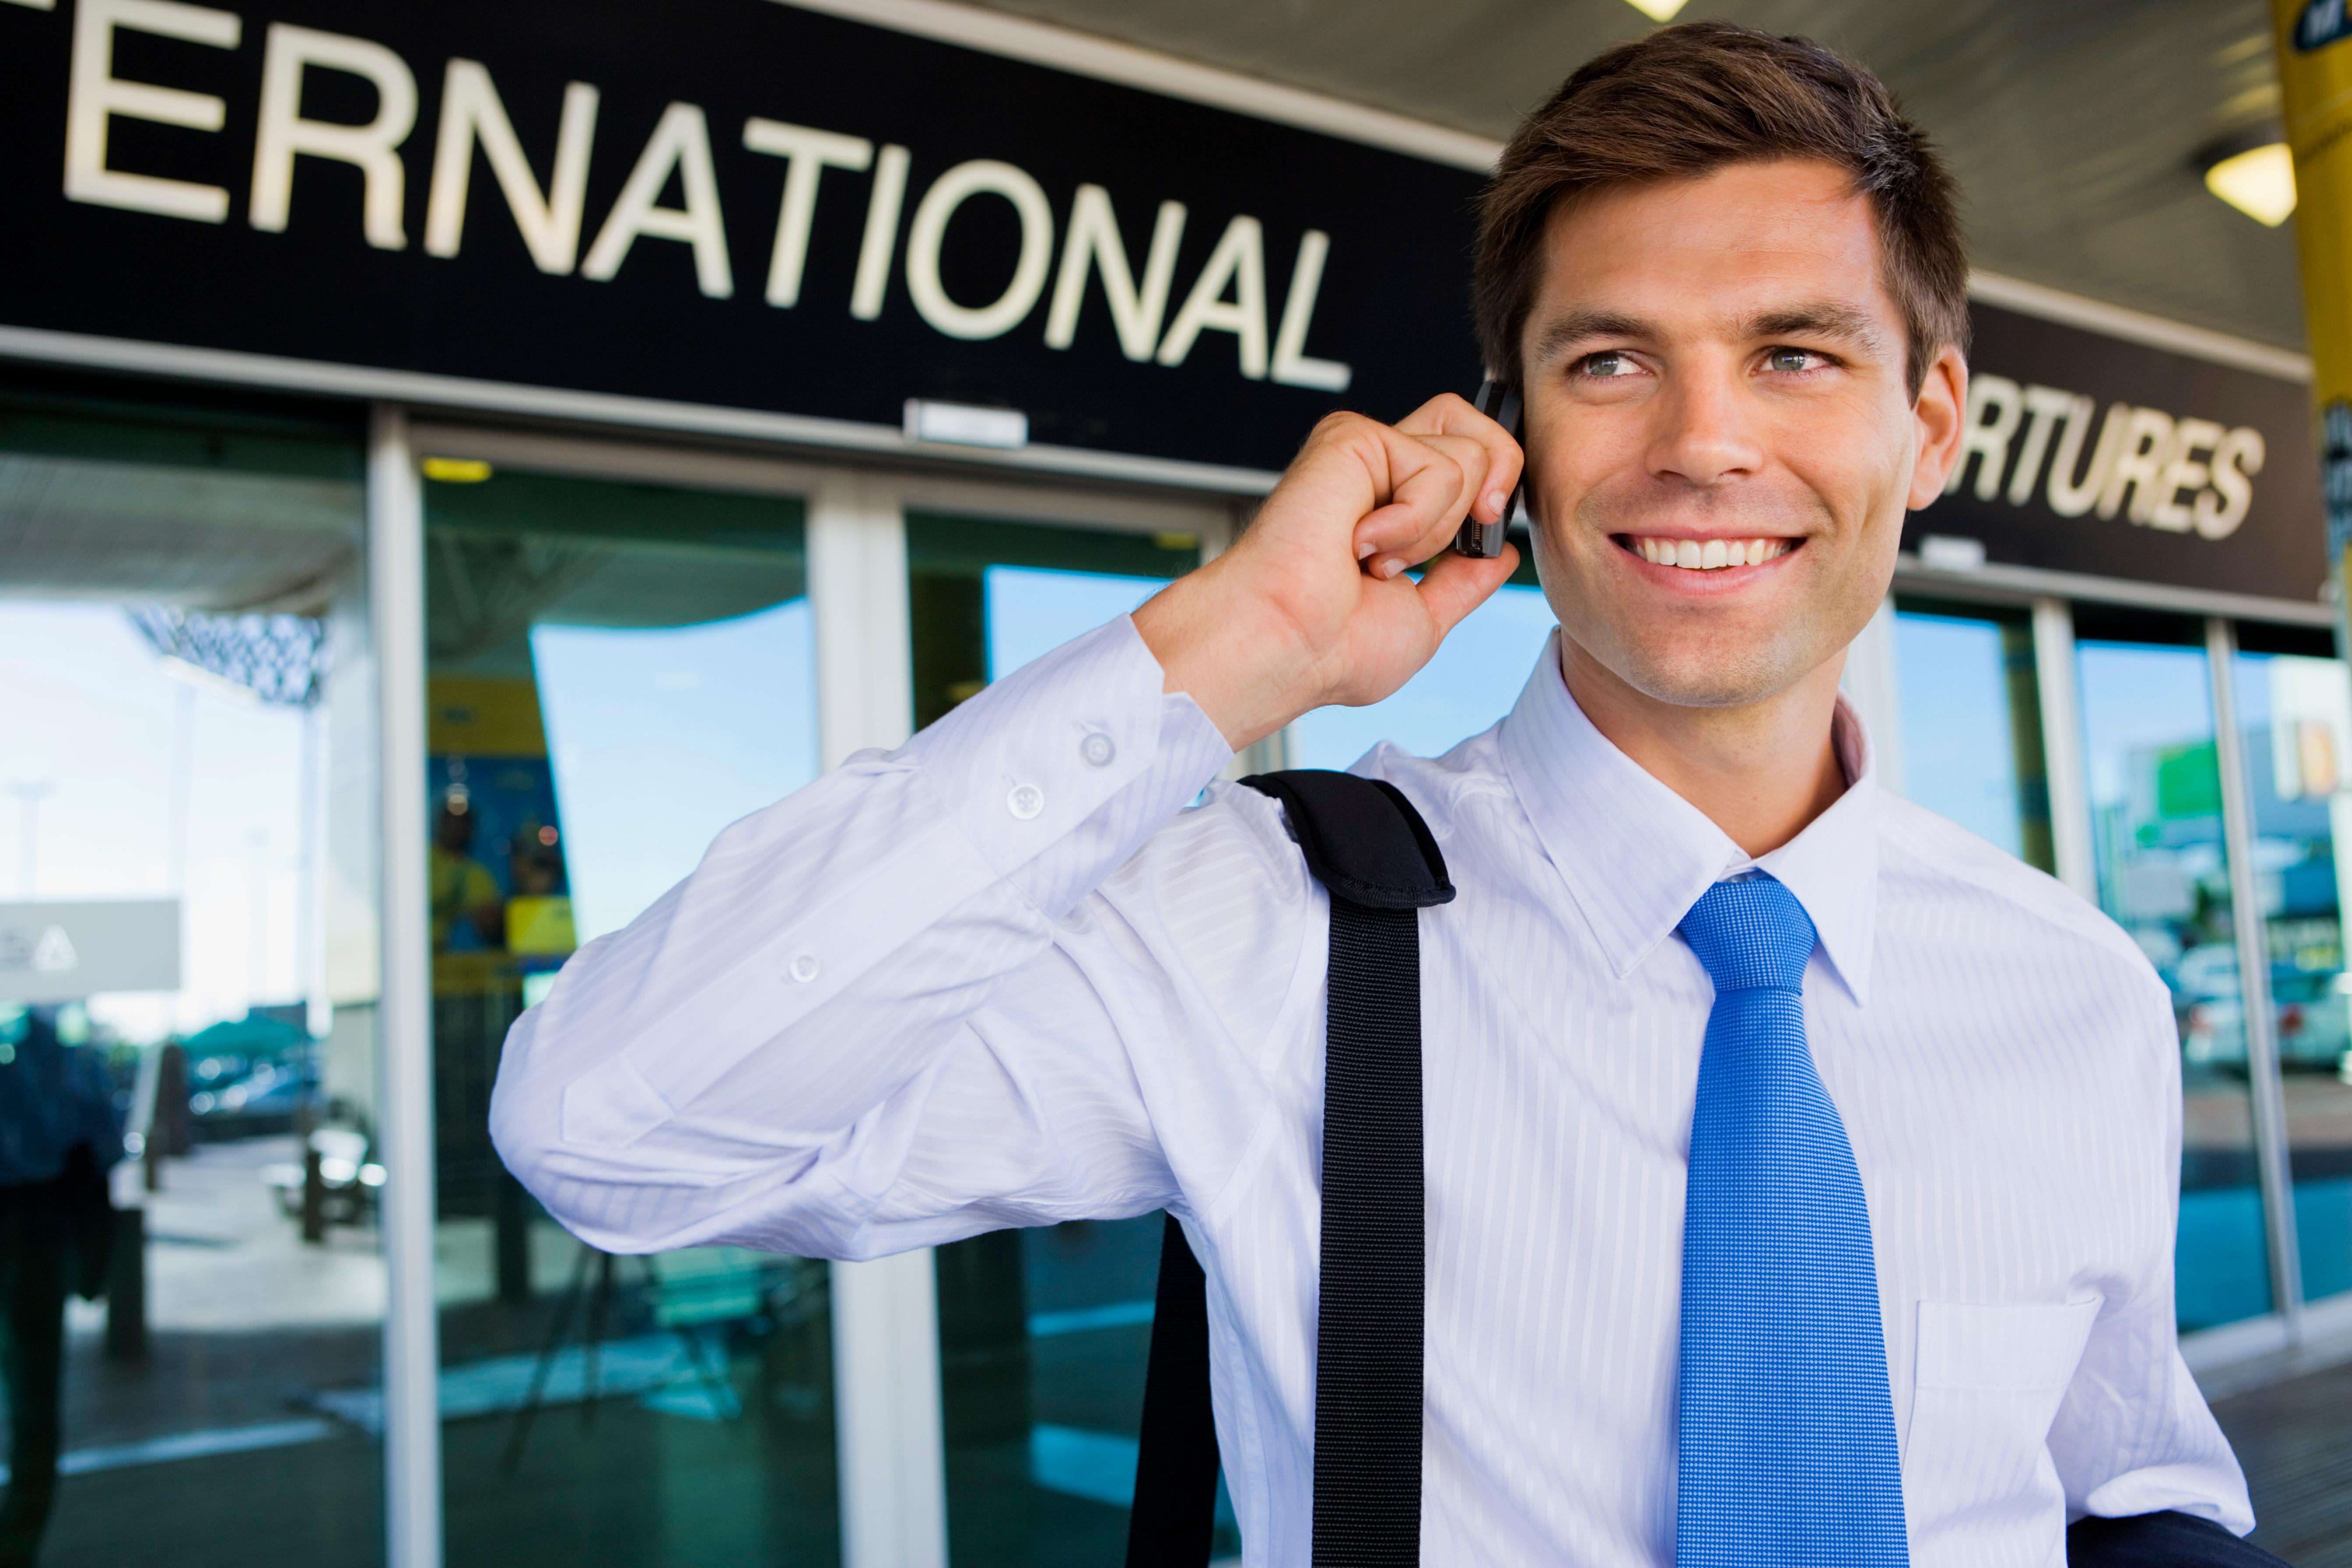 78655089_professional_man_travel_business.jpg